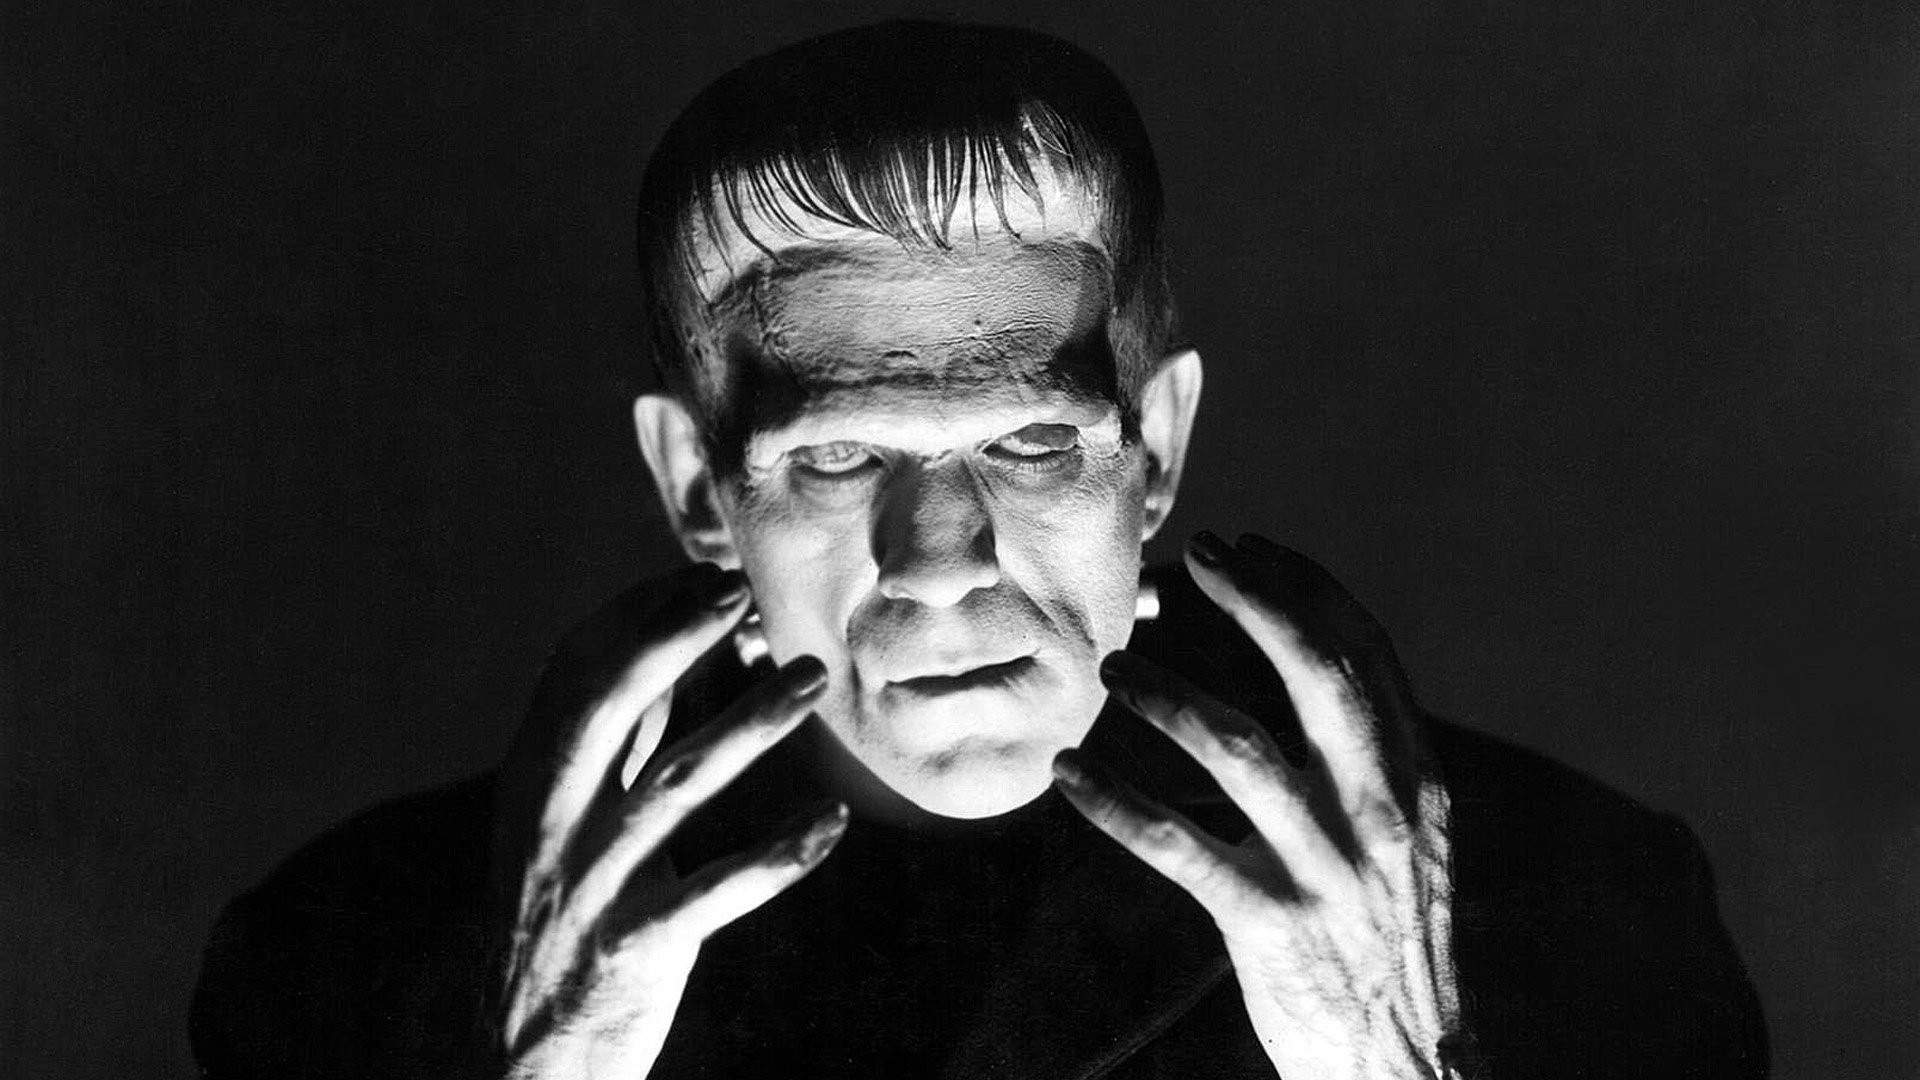 Question 10: Favorite classic horror movie: